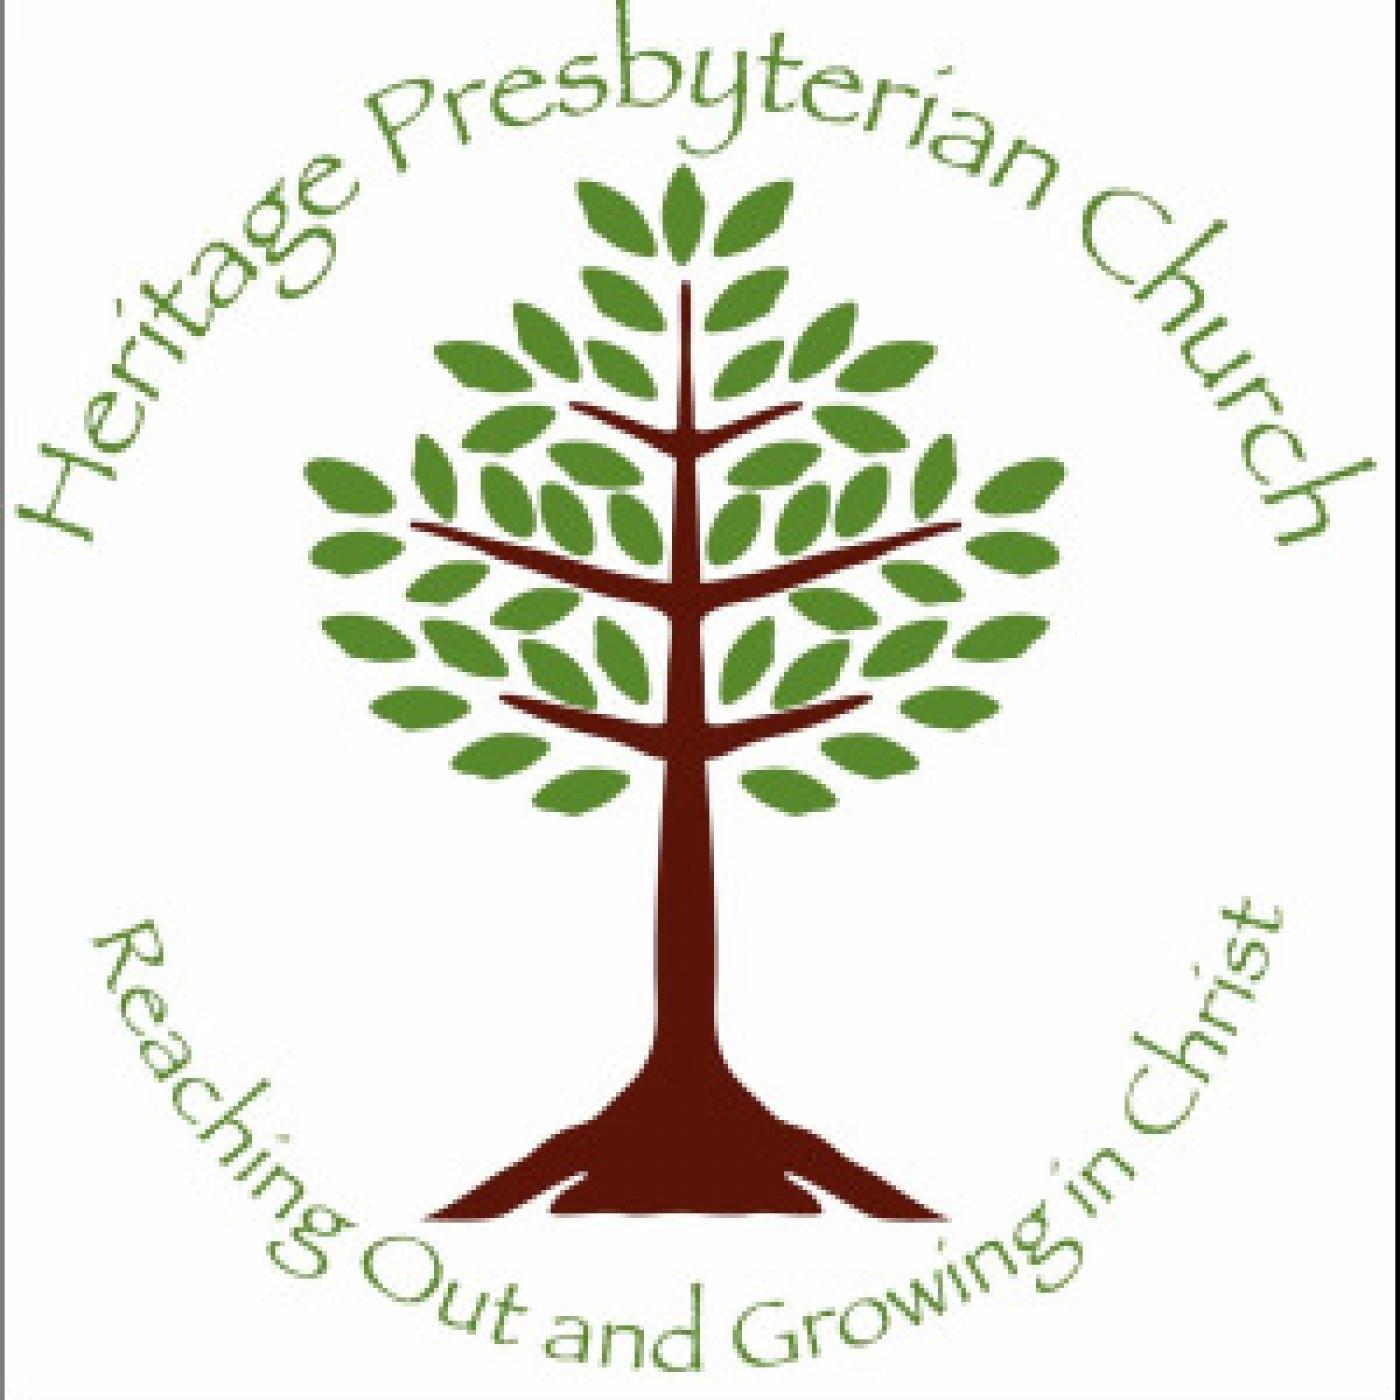 Sermons from Heritage Presbyterian Church, Olathe KS